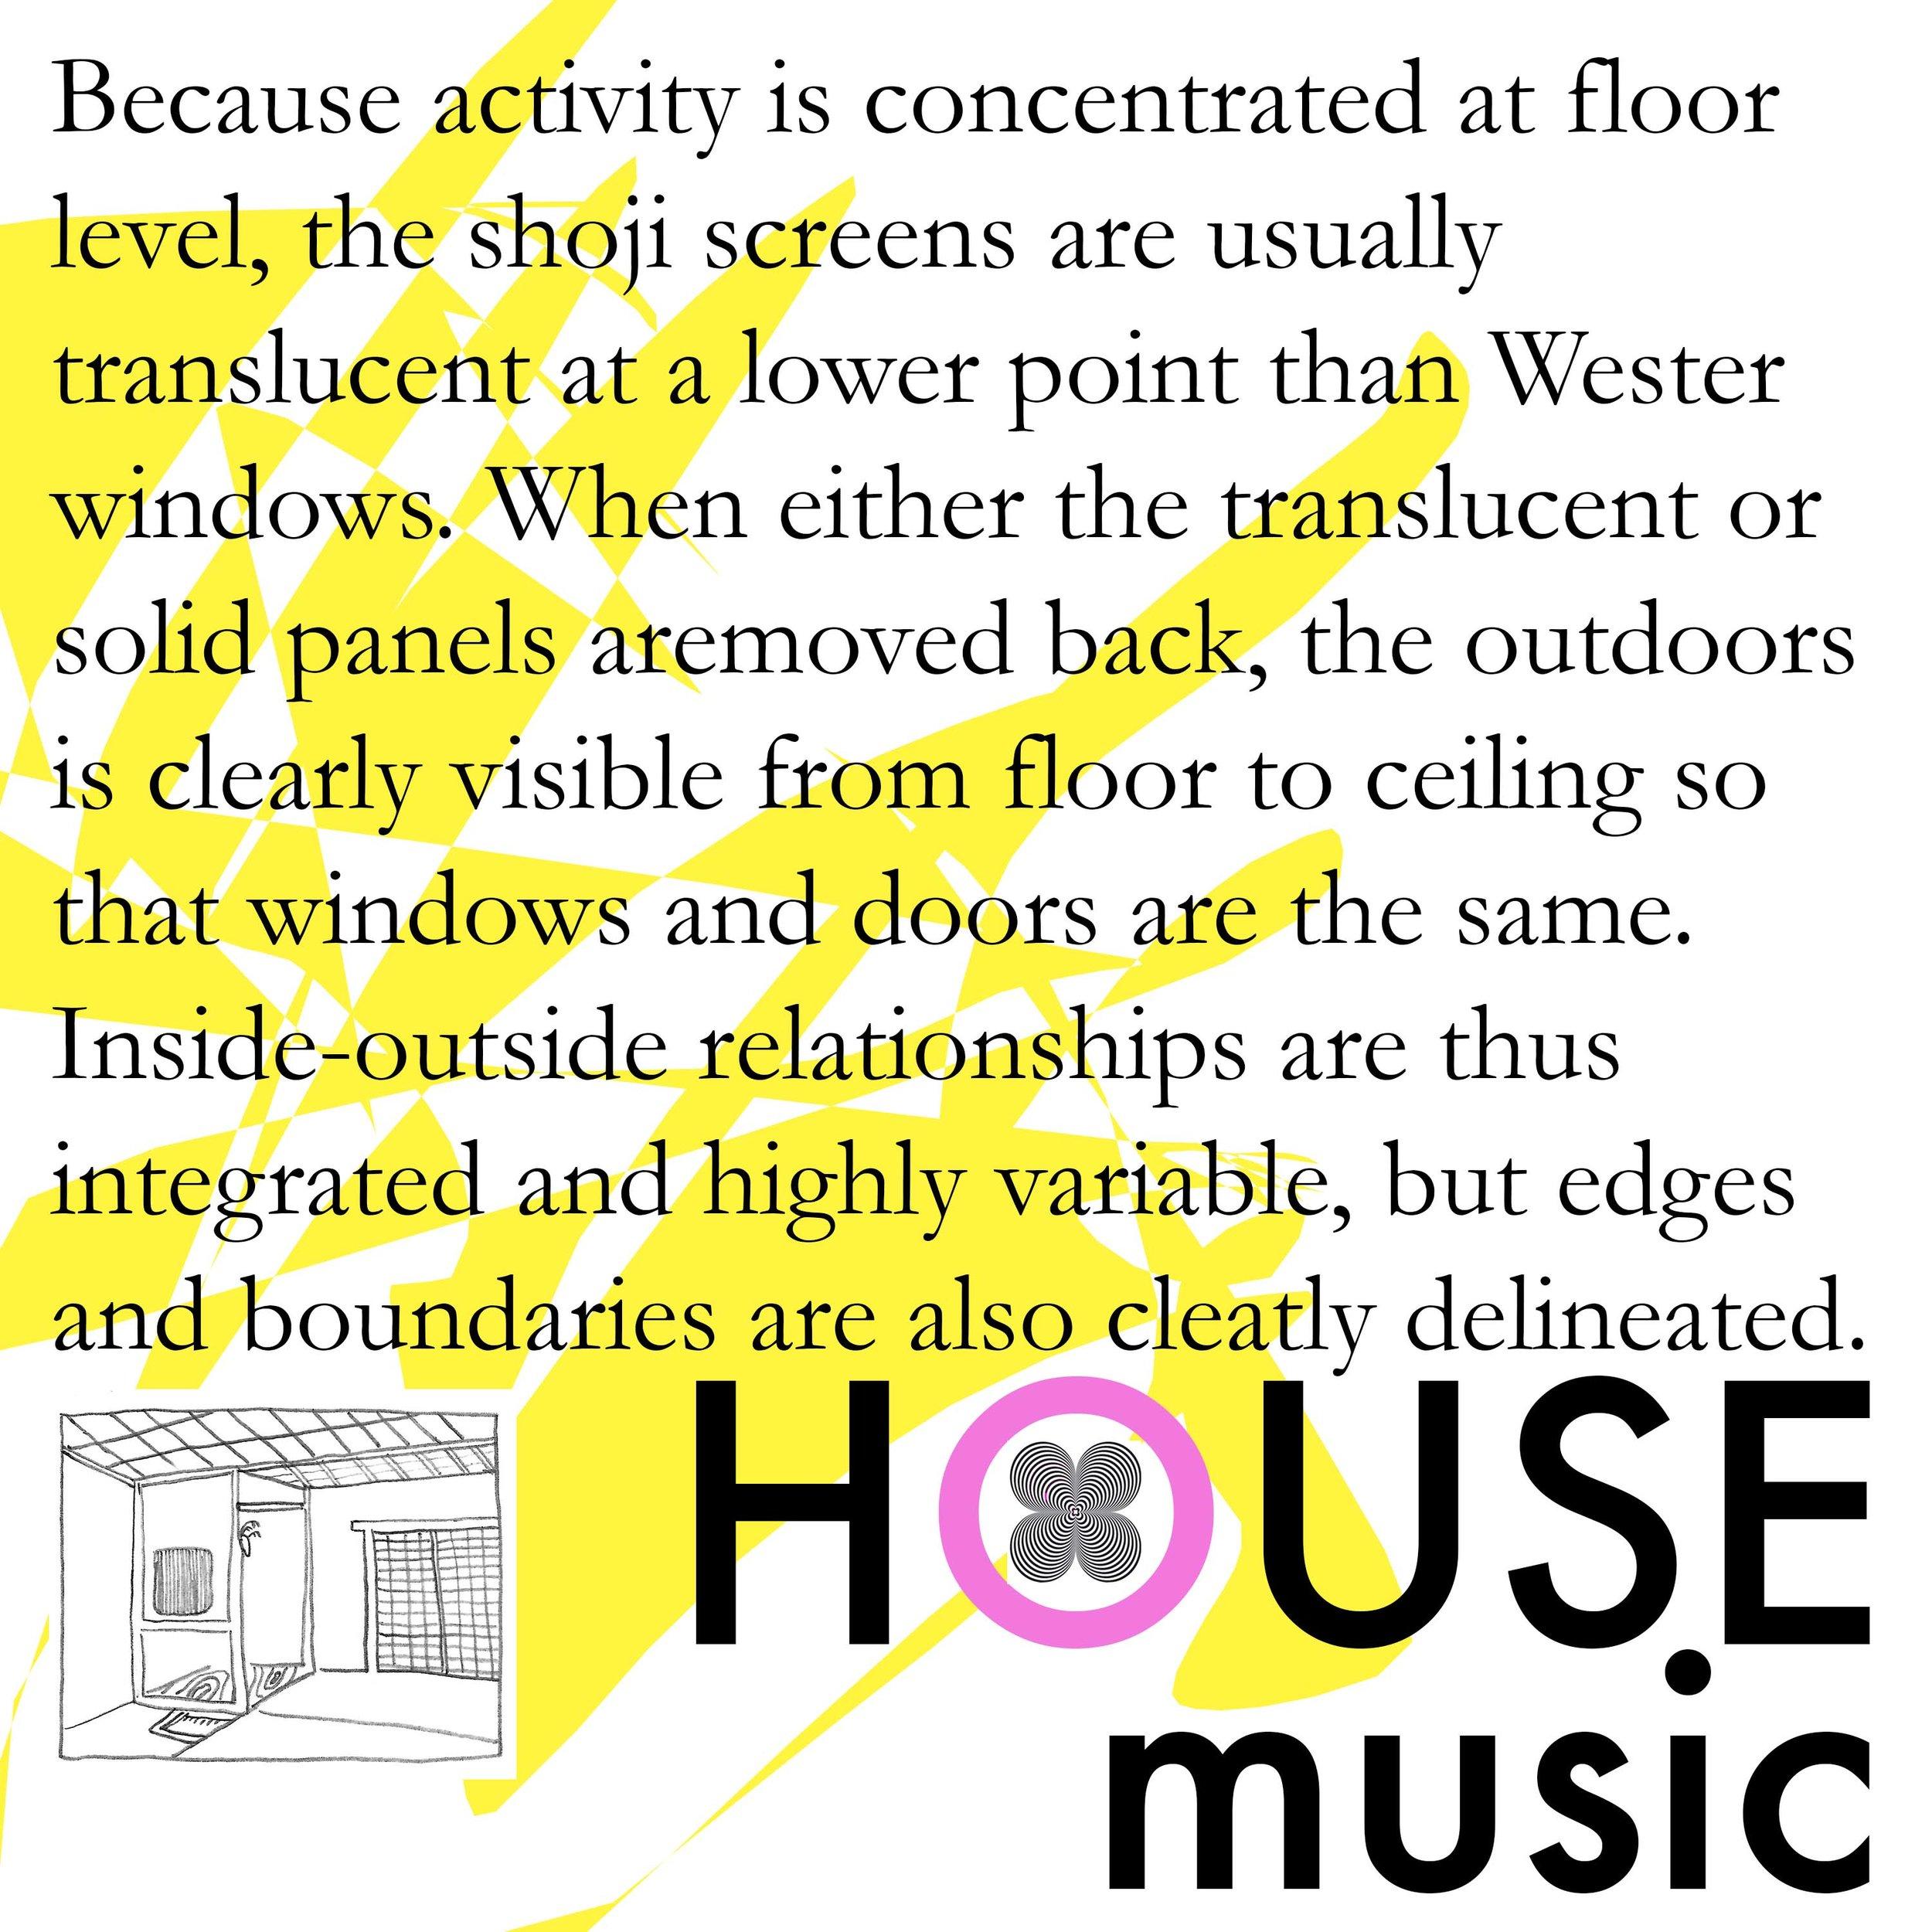 HOUSE MUSIC_NOTE.jpg